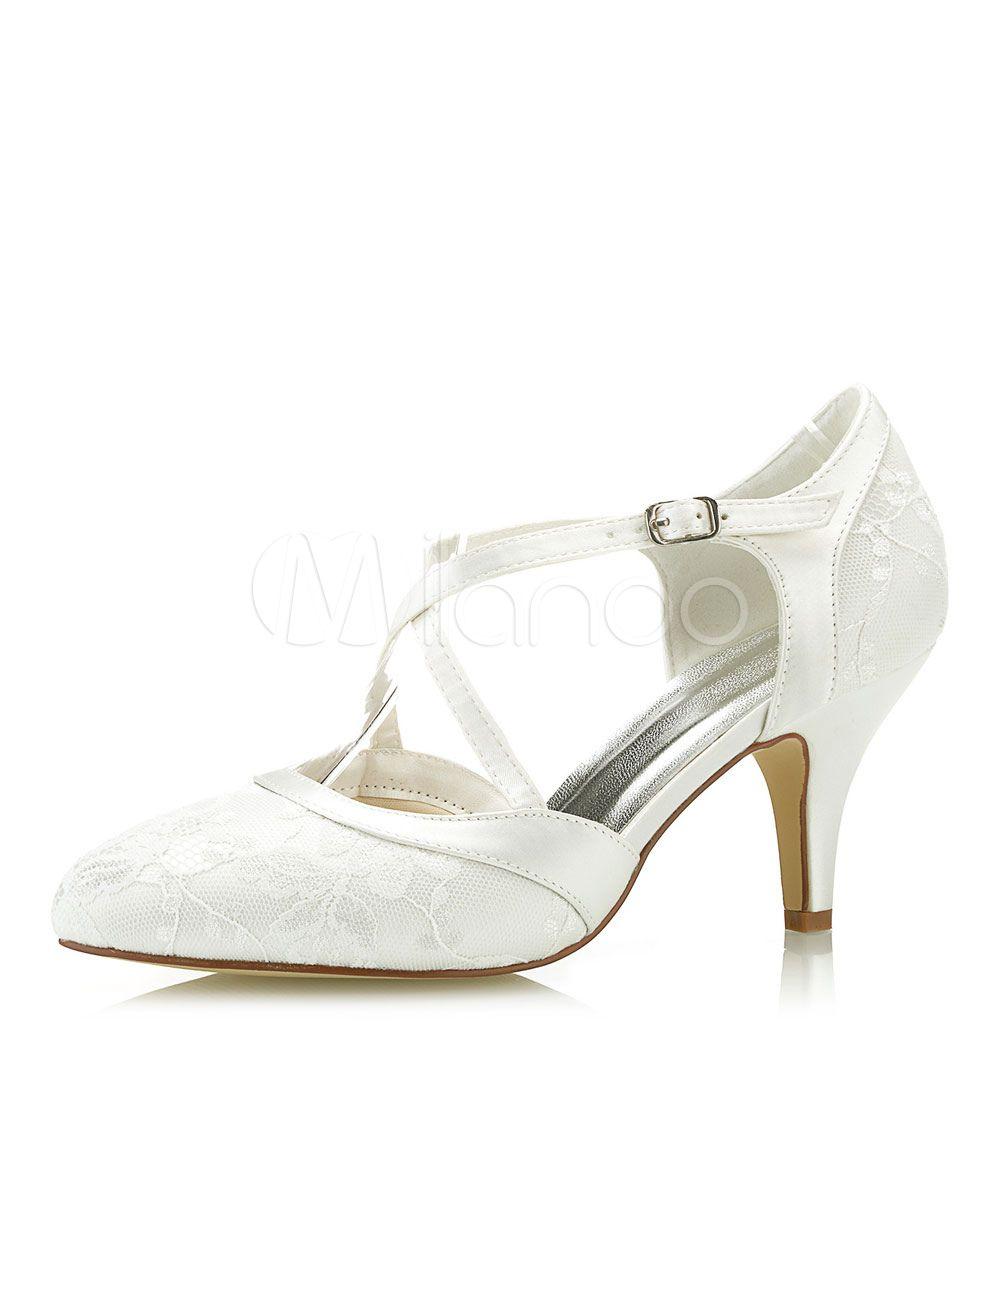 dc84c6b6b13 Ivory Wedding Shoes Lace Pointed Toe Criss Cross Vintage Bridal ...